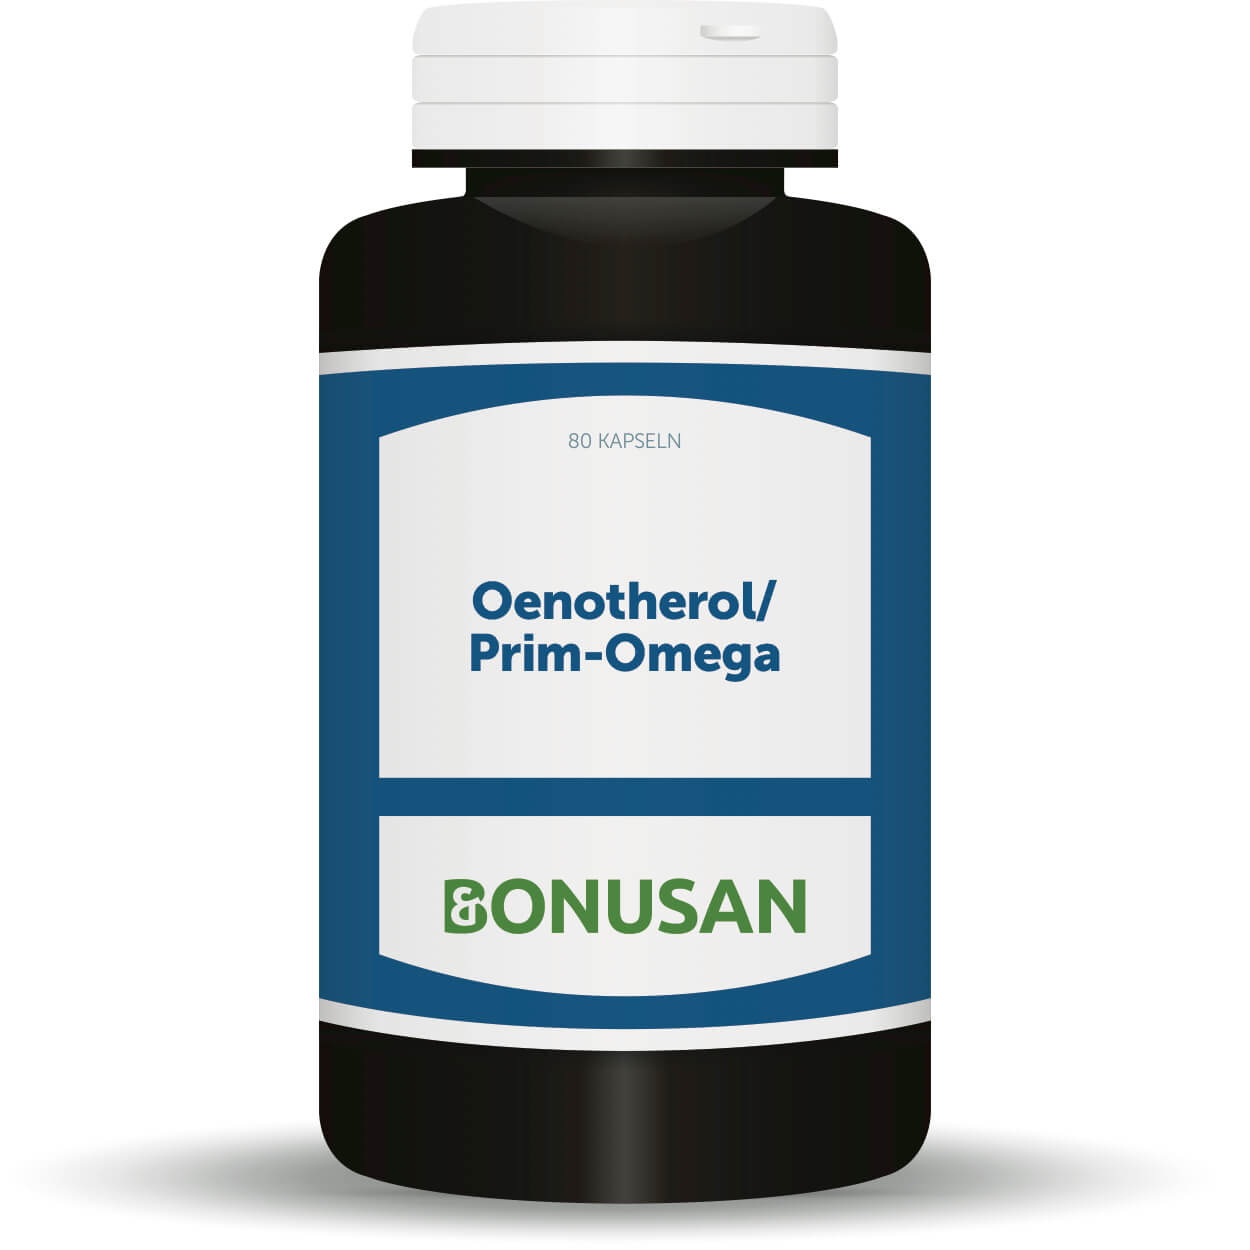 Oenotherol/Prim-Omega